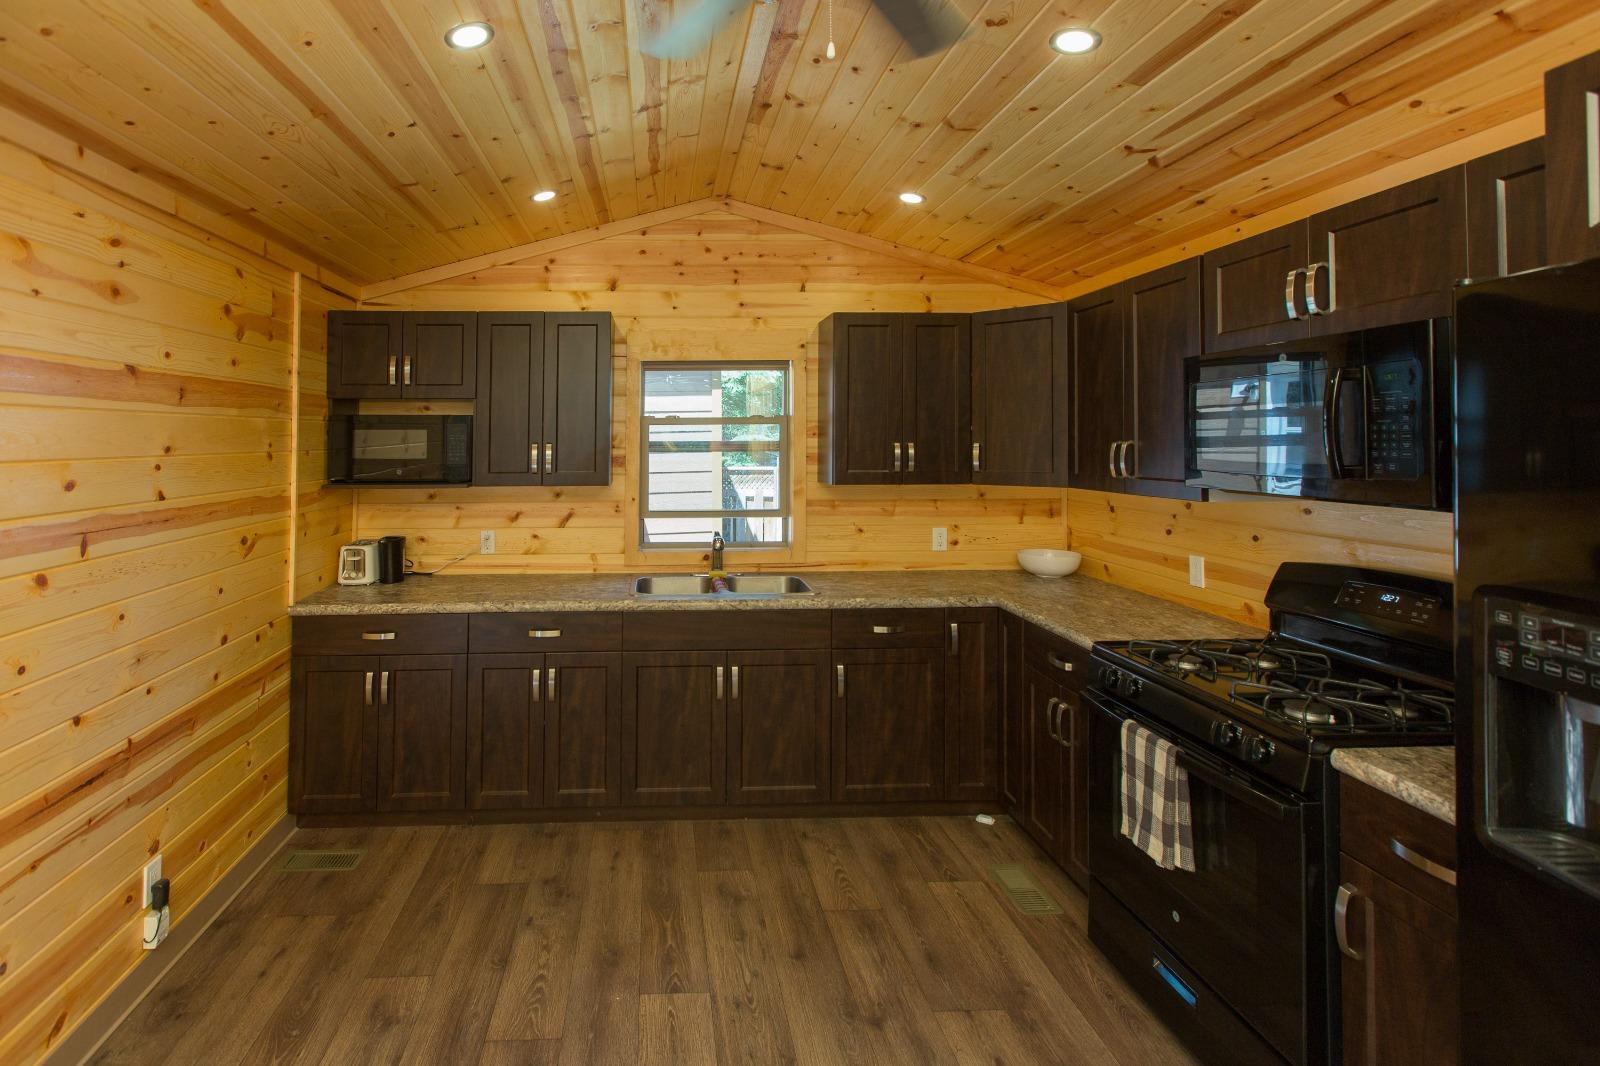 Staff accommodations - kitchen interior